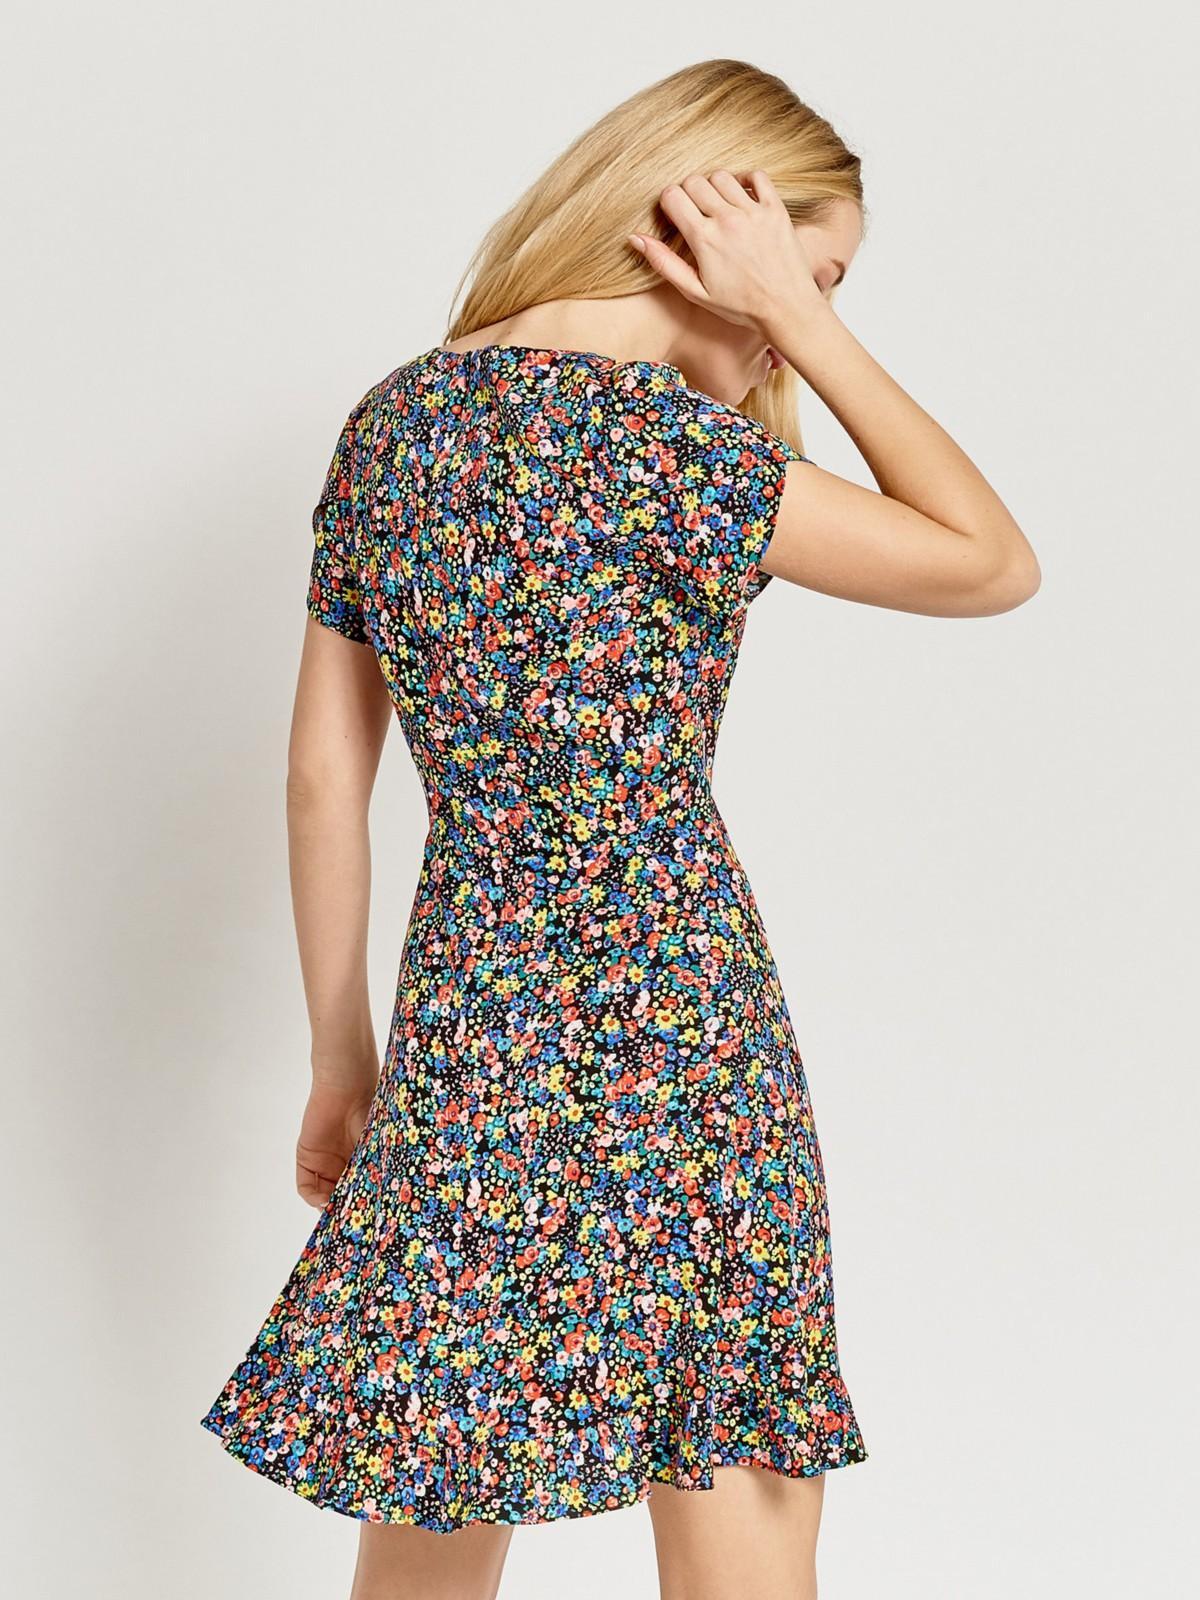 OASIS Ditsy Frill Hem Skater Multi  Floral Printed Dress